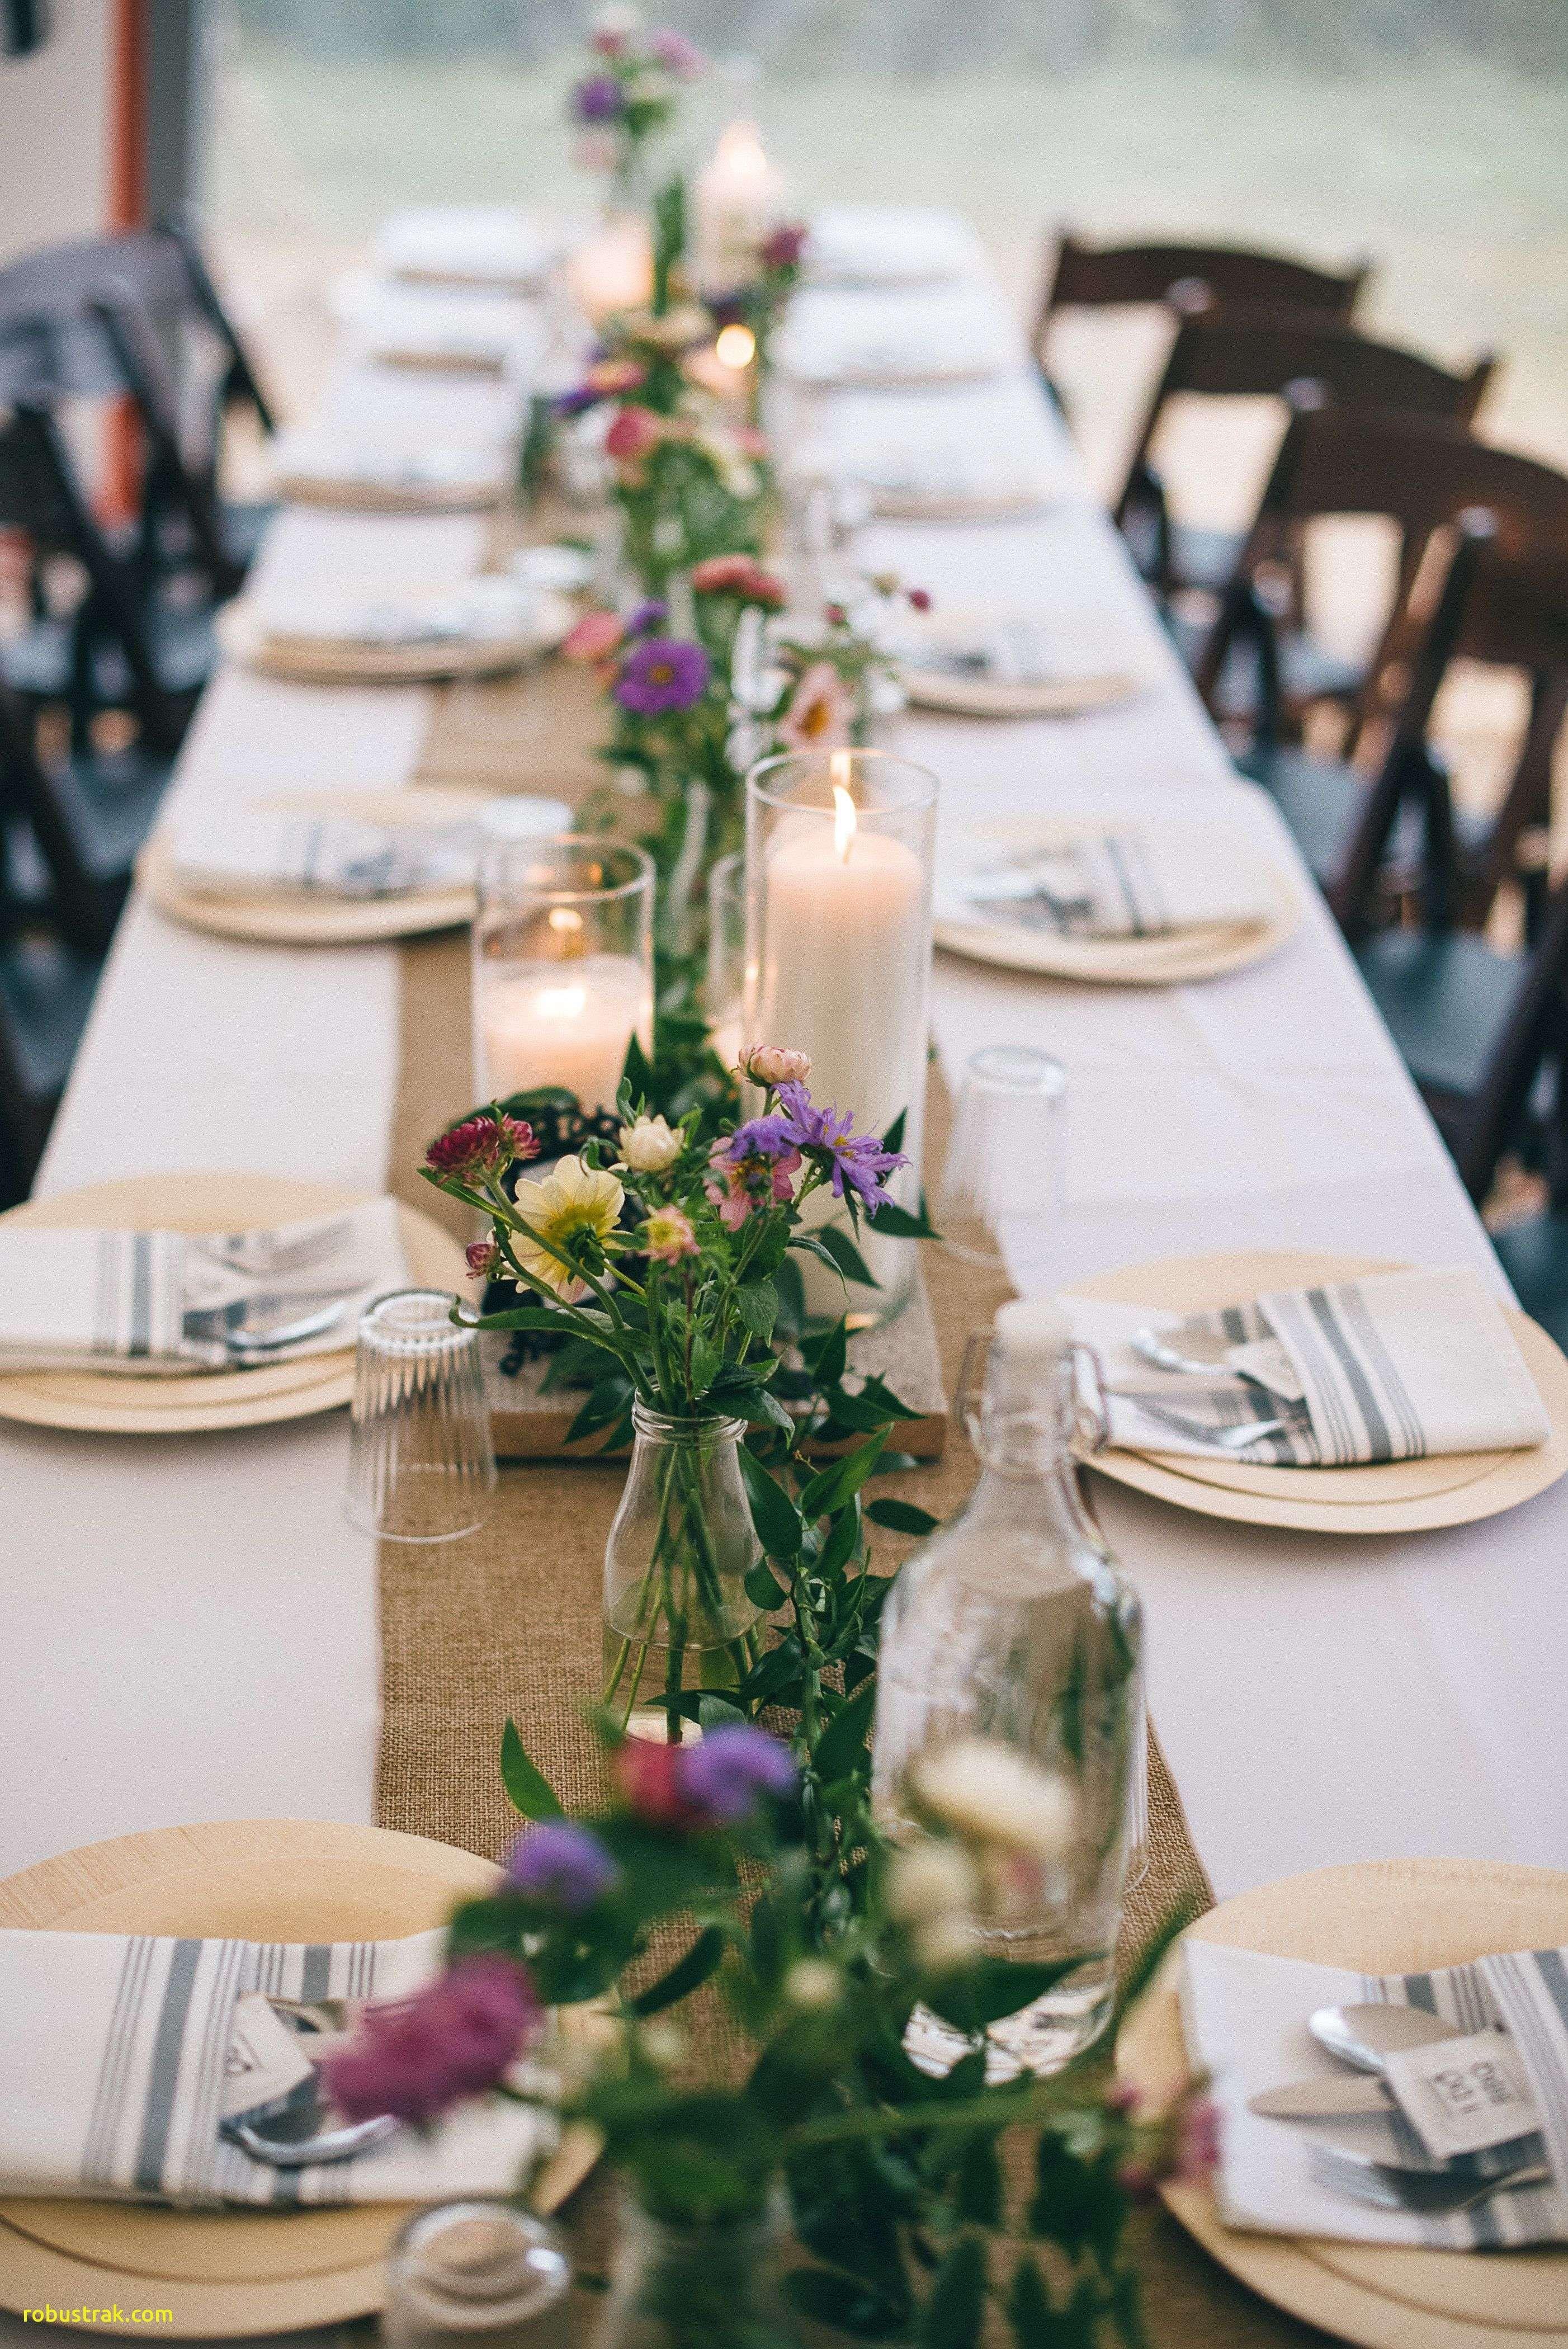 Beautiful Farm Wedding Table Decor Home Design Ideas Reception Table Decorations Rustic Wedding Table Runners Wedding Reception Table Decorations